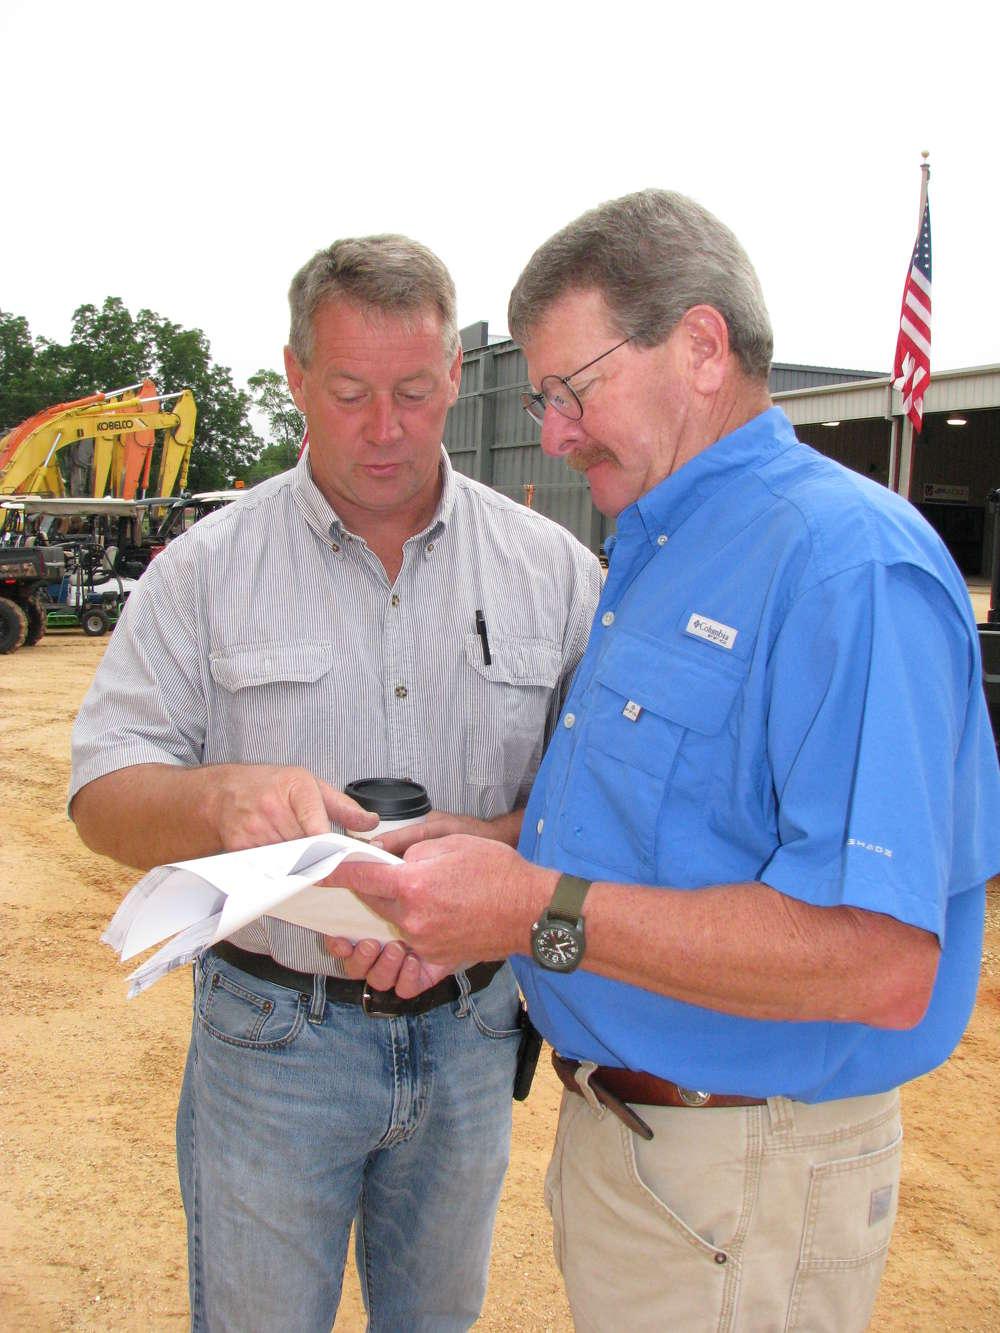 Bill Woods (L) of Woods Equipment, Nashville, Tenn., asks Phil Lucius, JM Wood, a question.